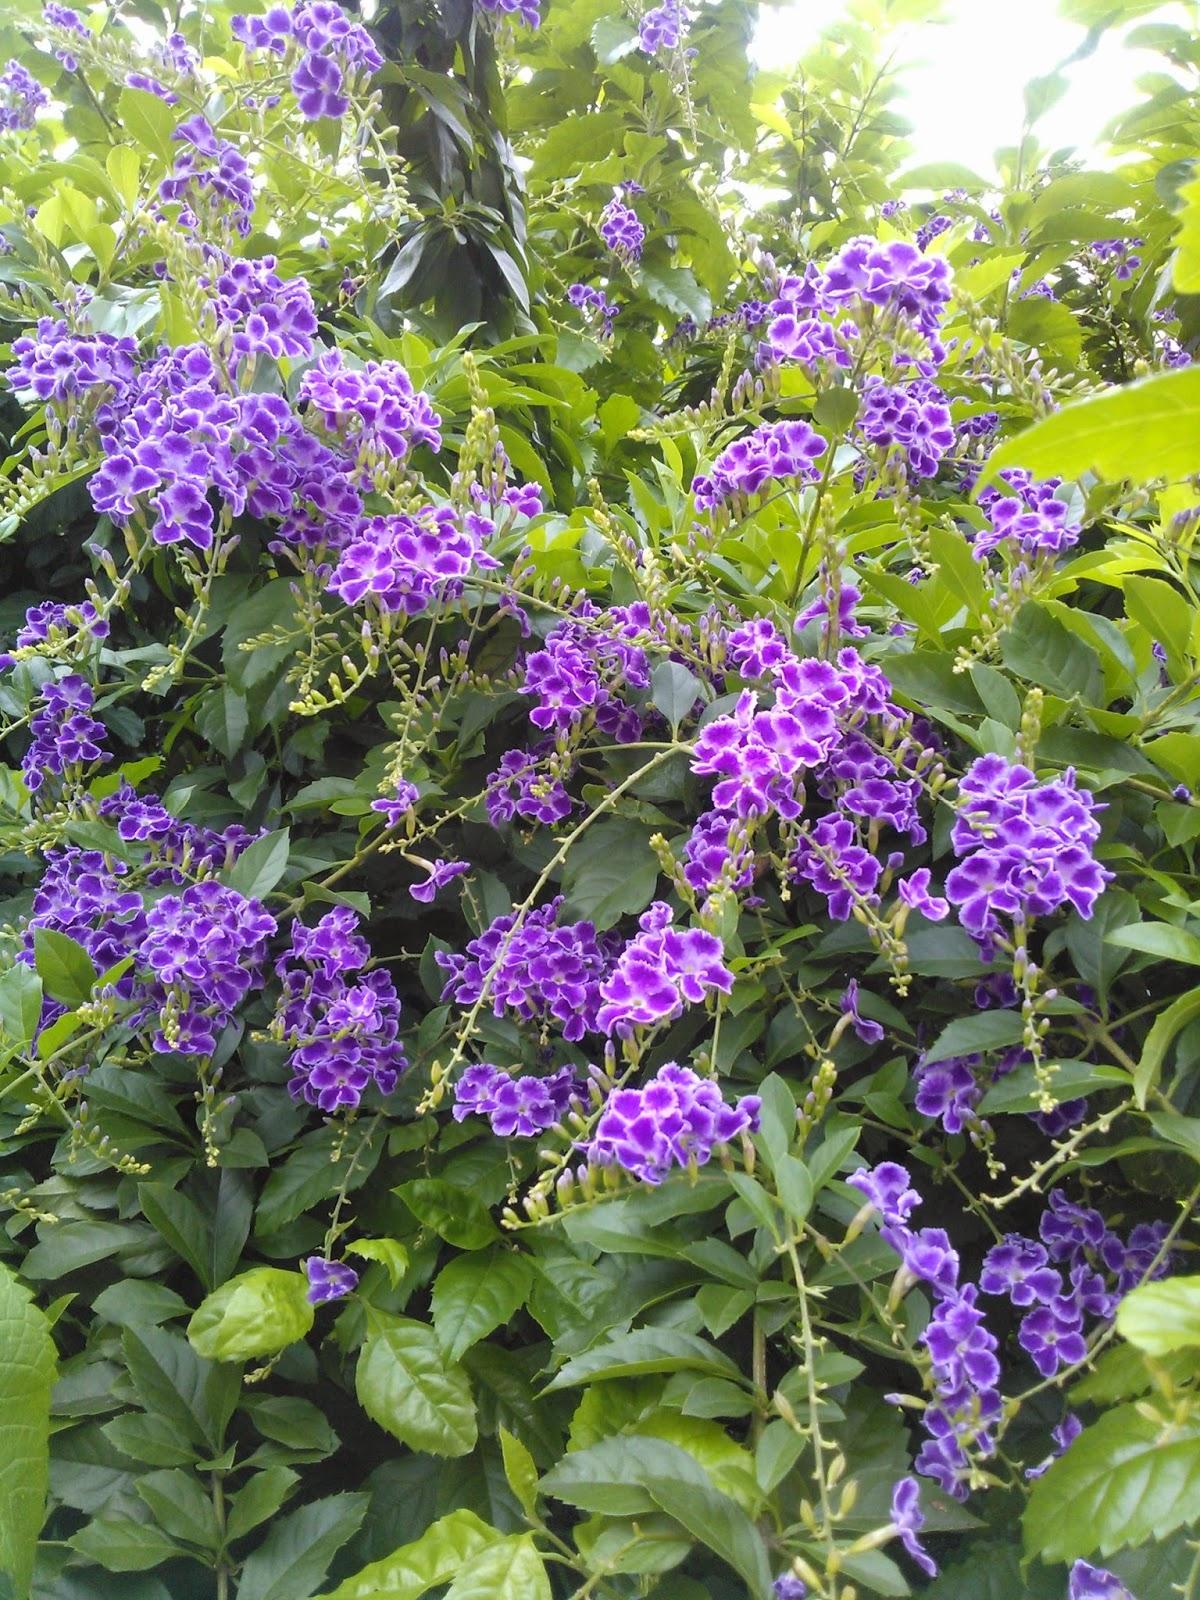 DWAN雲之端: 蕾絲金露花--英文名稱: Lace Golden Dewdrops,主要從事紡織布料之生產與加工,位於臺灣臺中,Purple Skyflower.;有別於金露花 ...